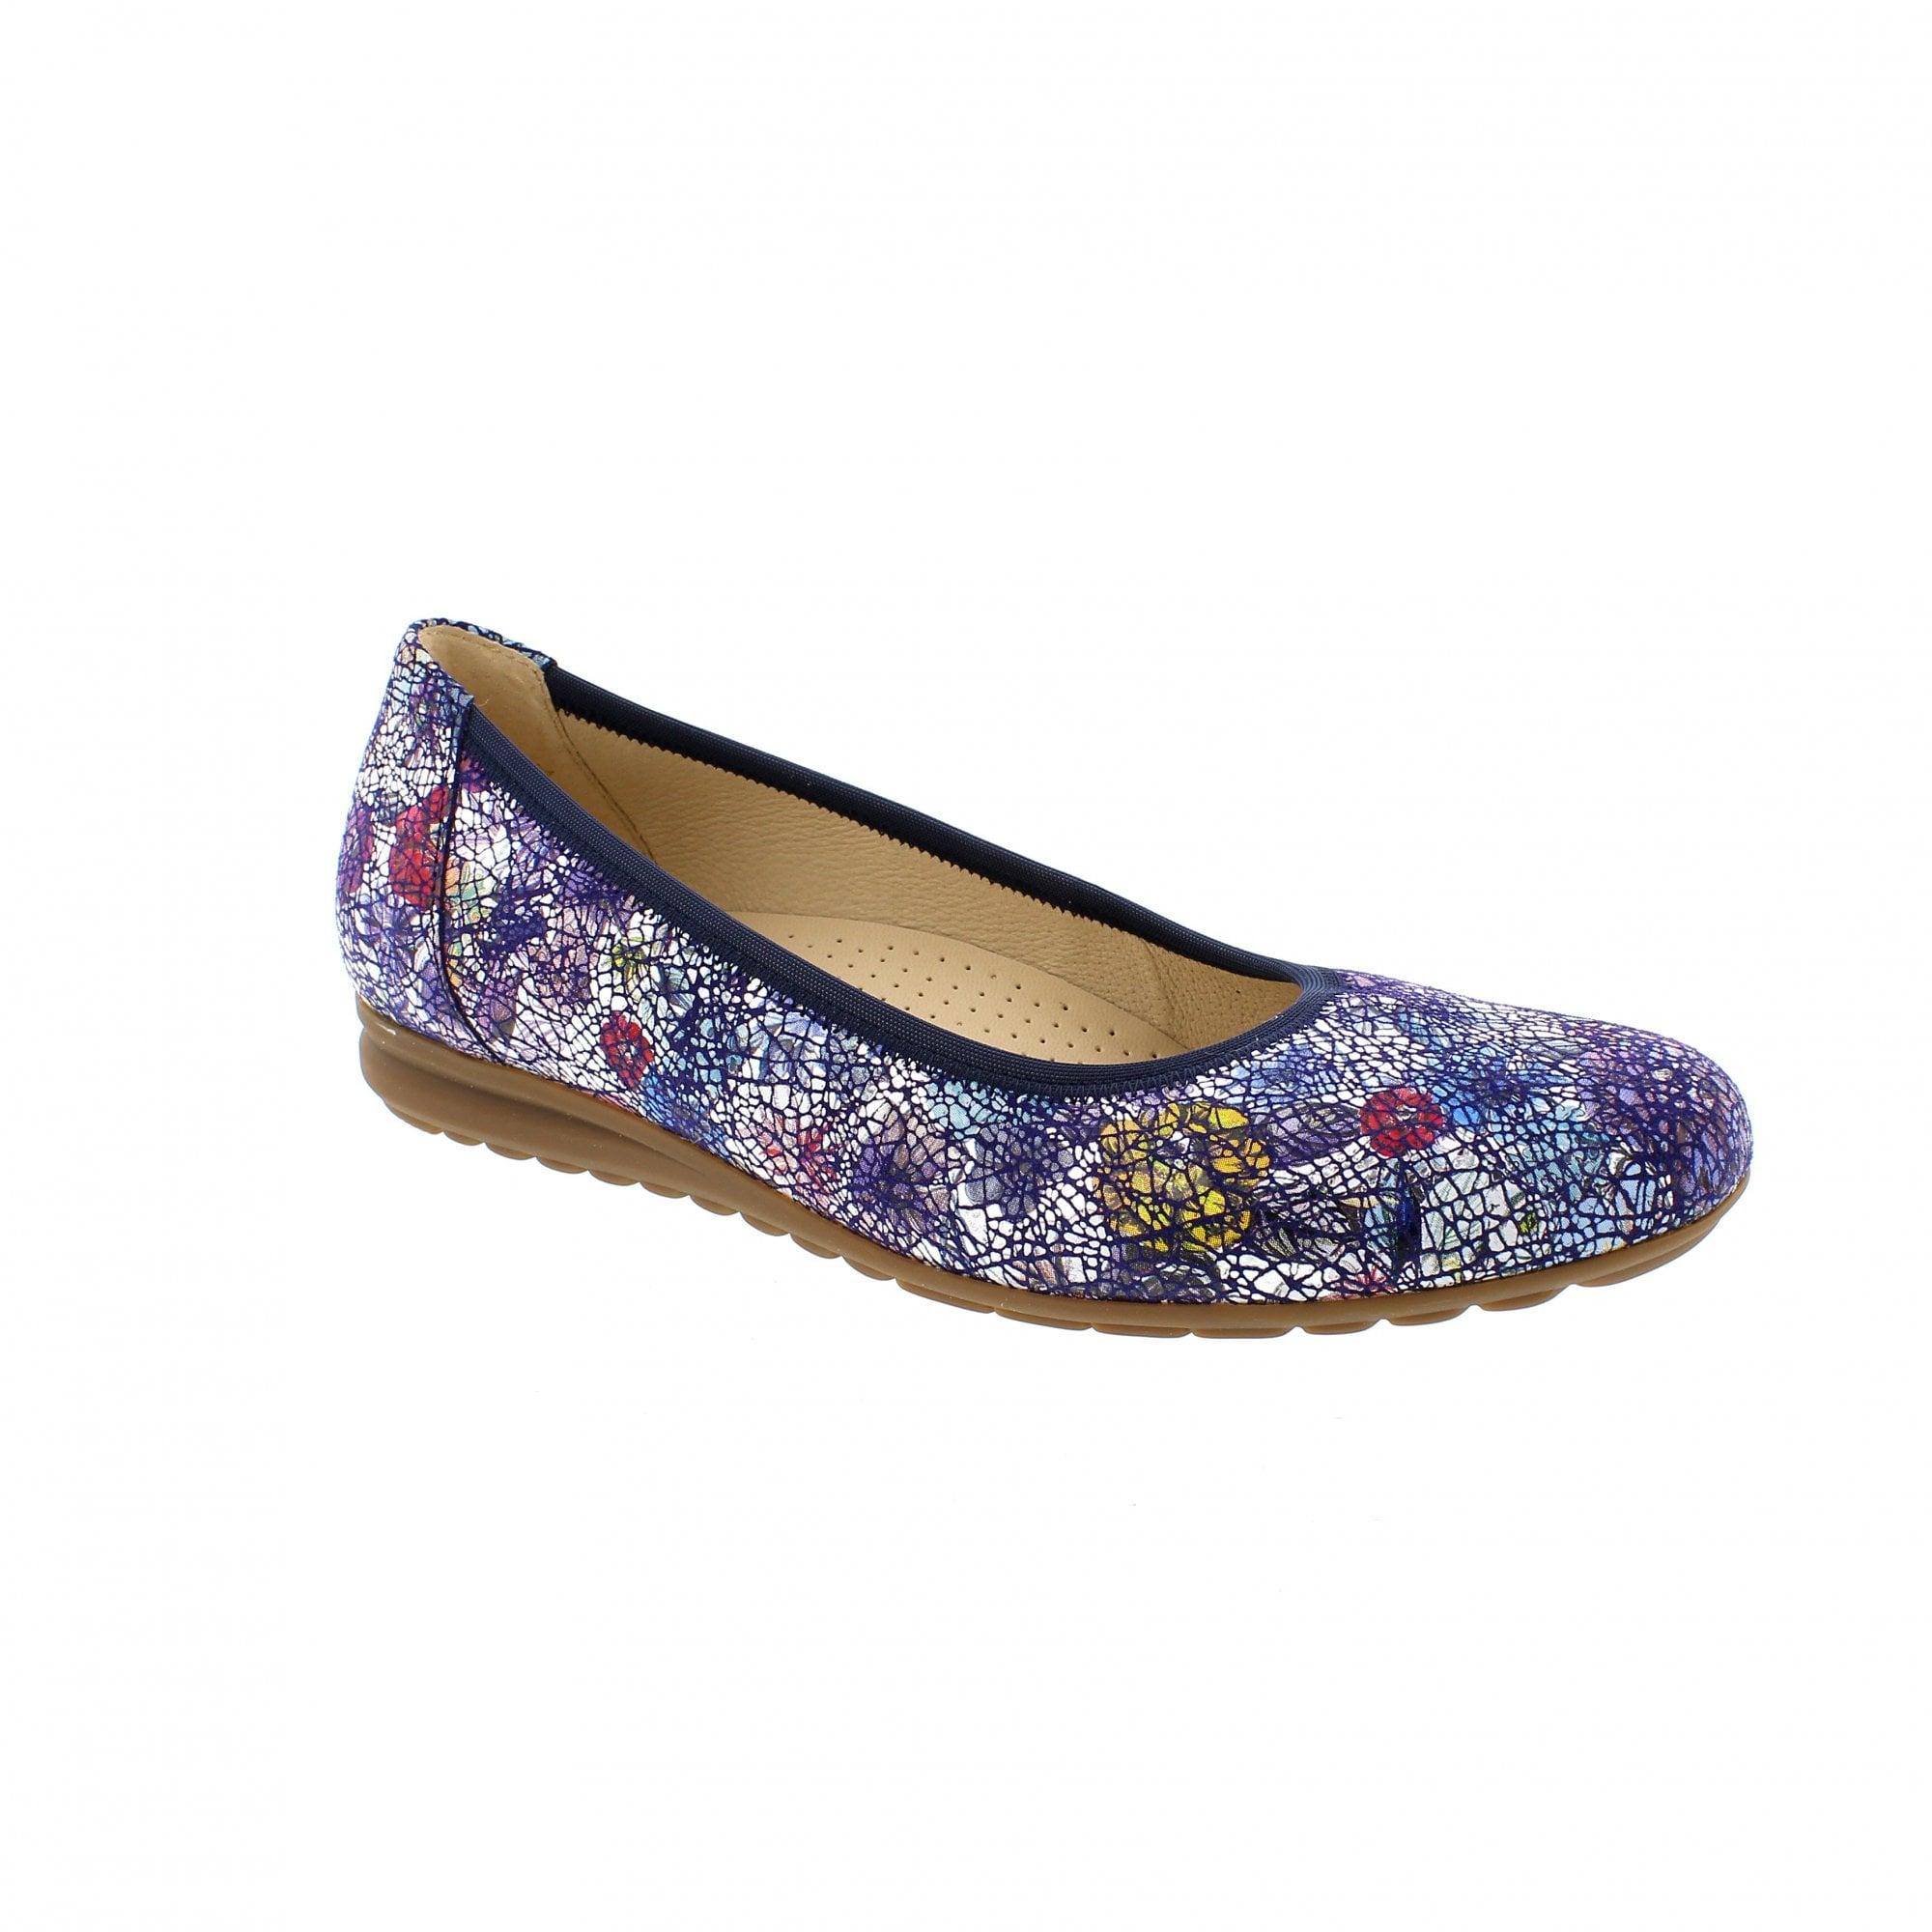 a315b30264dc3 Gabor Splash 22-620-36 Navy/Silver Womens Pumps   Rogerson Shoes